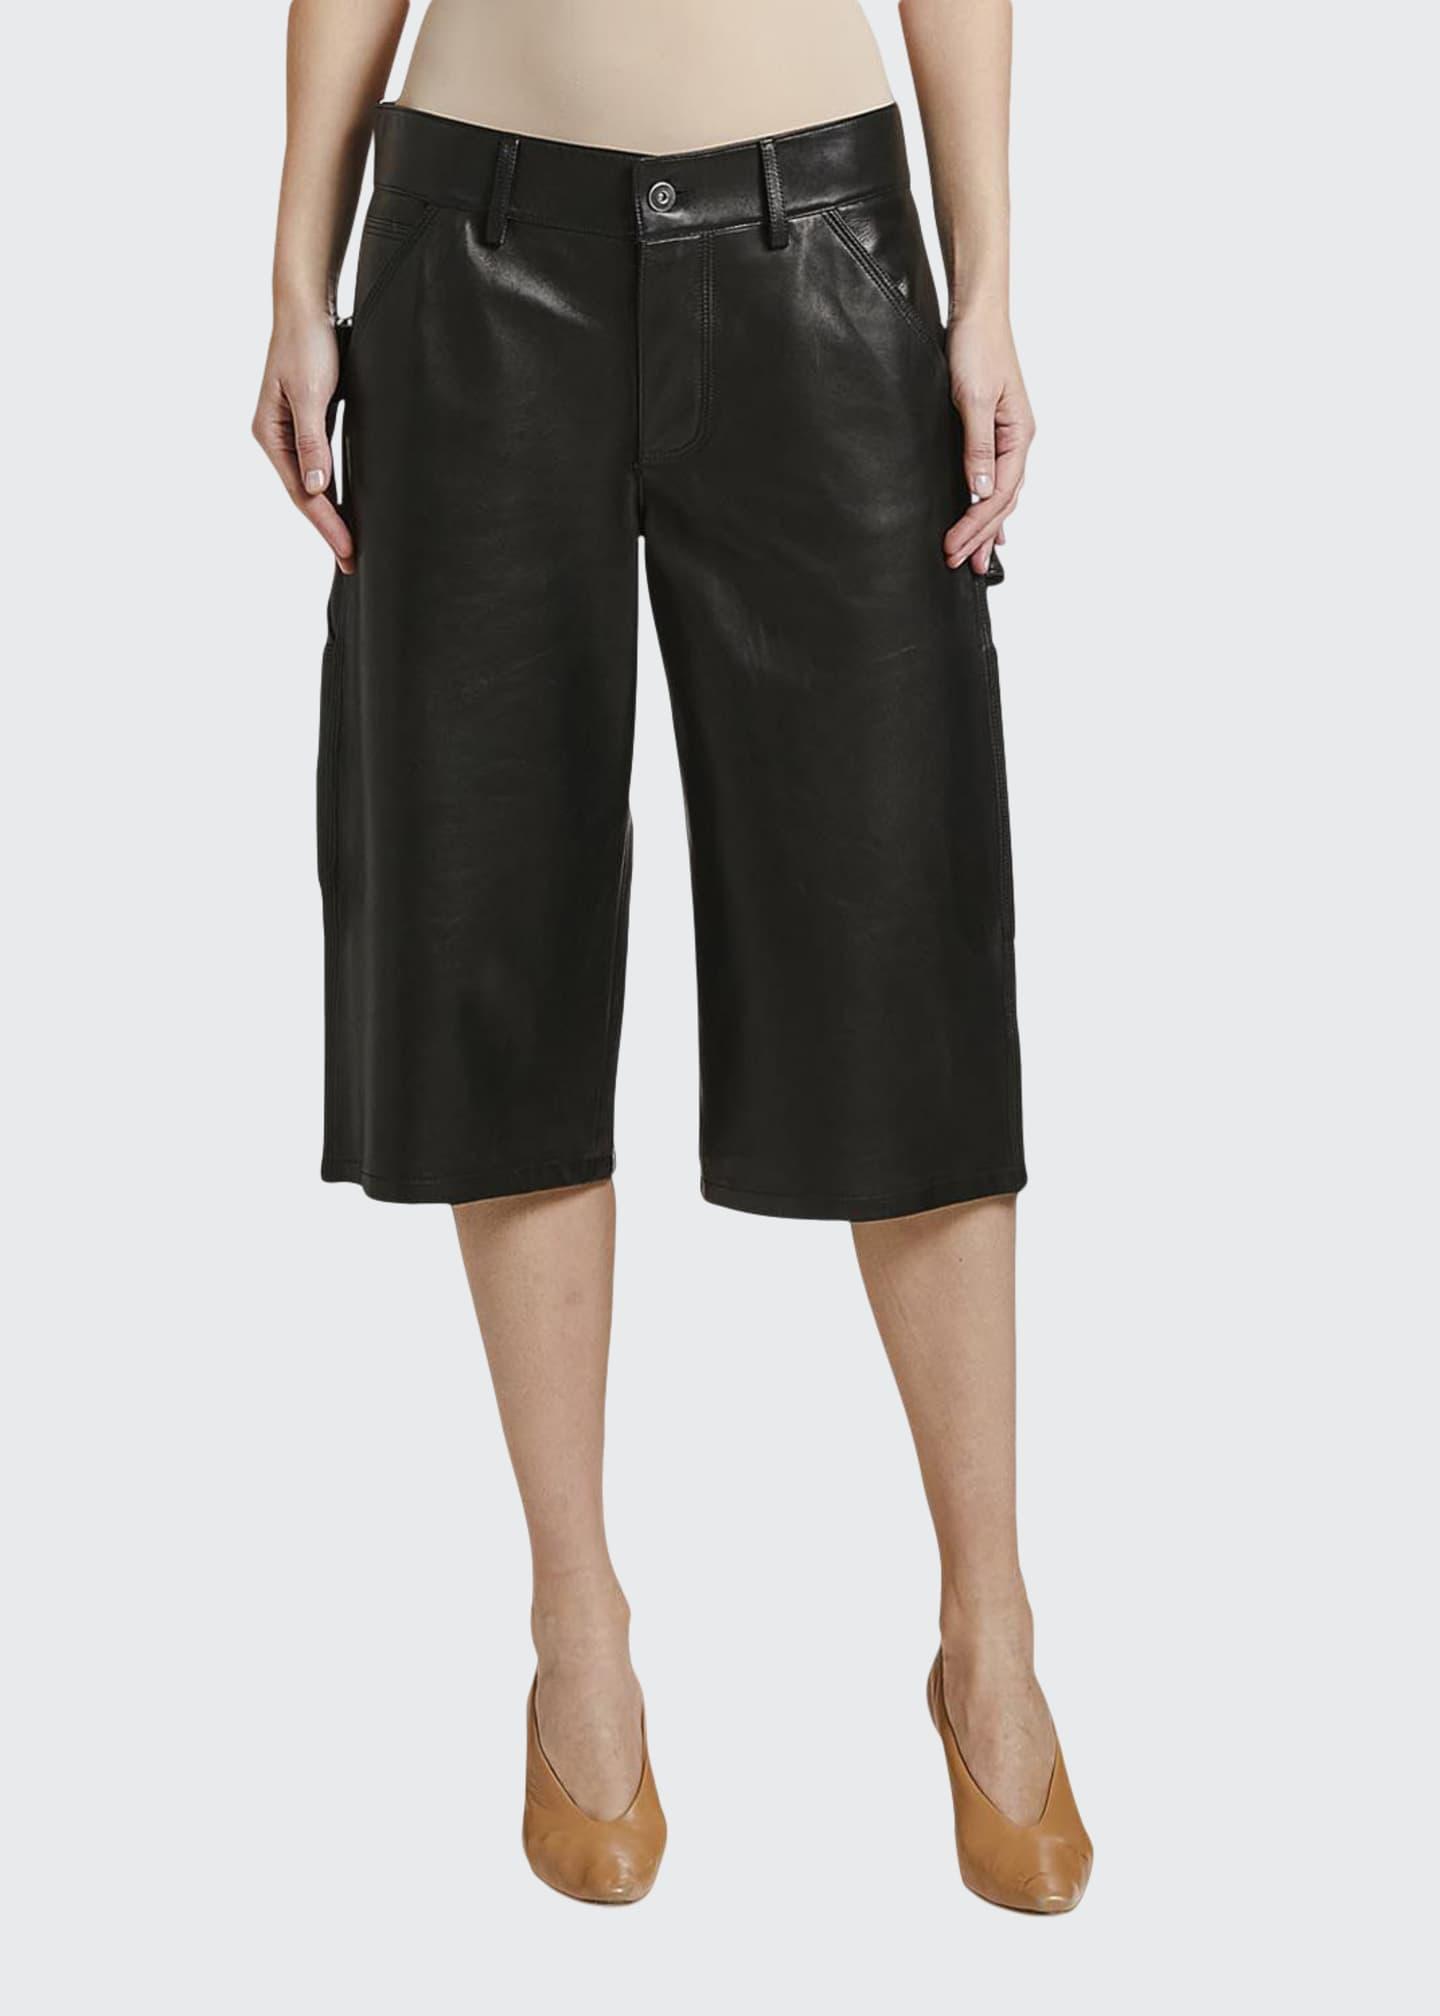 Bottega Veneta Wide-Leg Leather Culotte Shorts